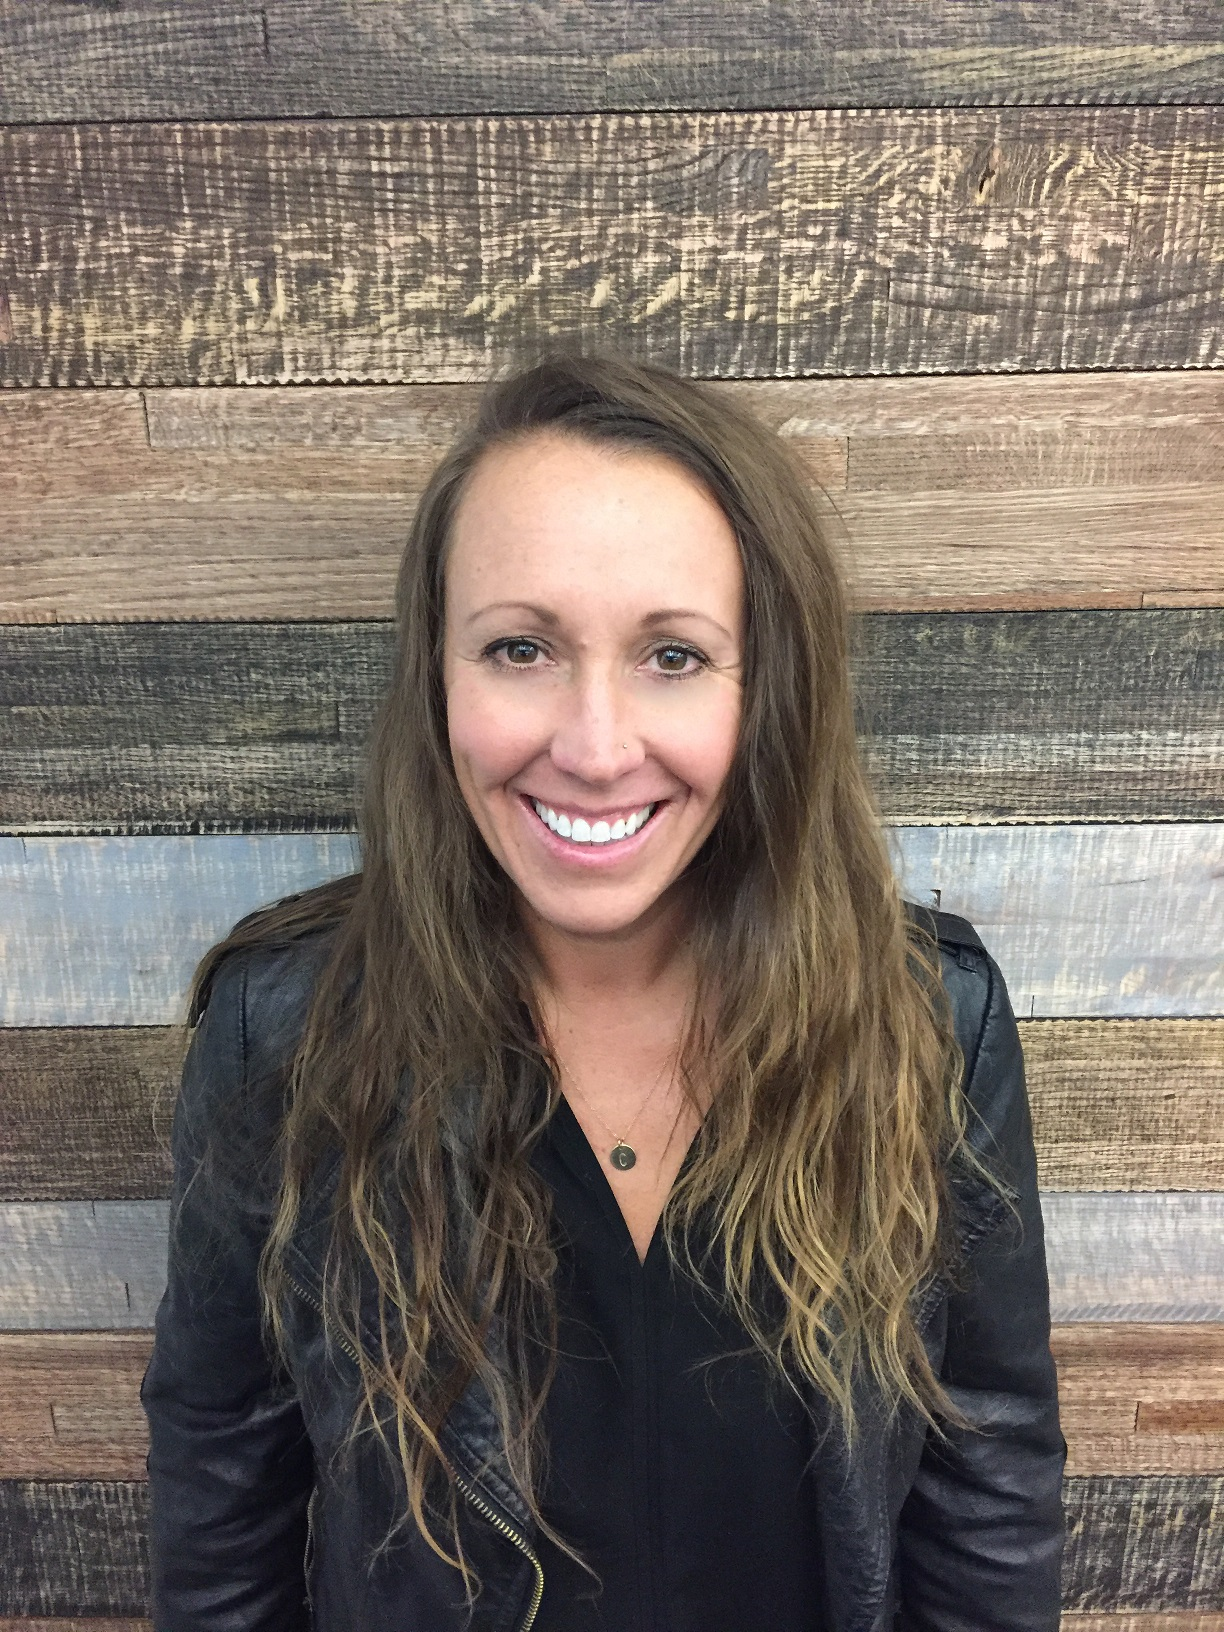 Match Marketing Group Hires Liesl Holtz as adidas Account Director